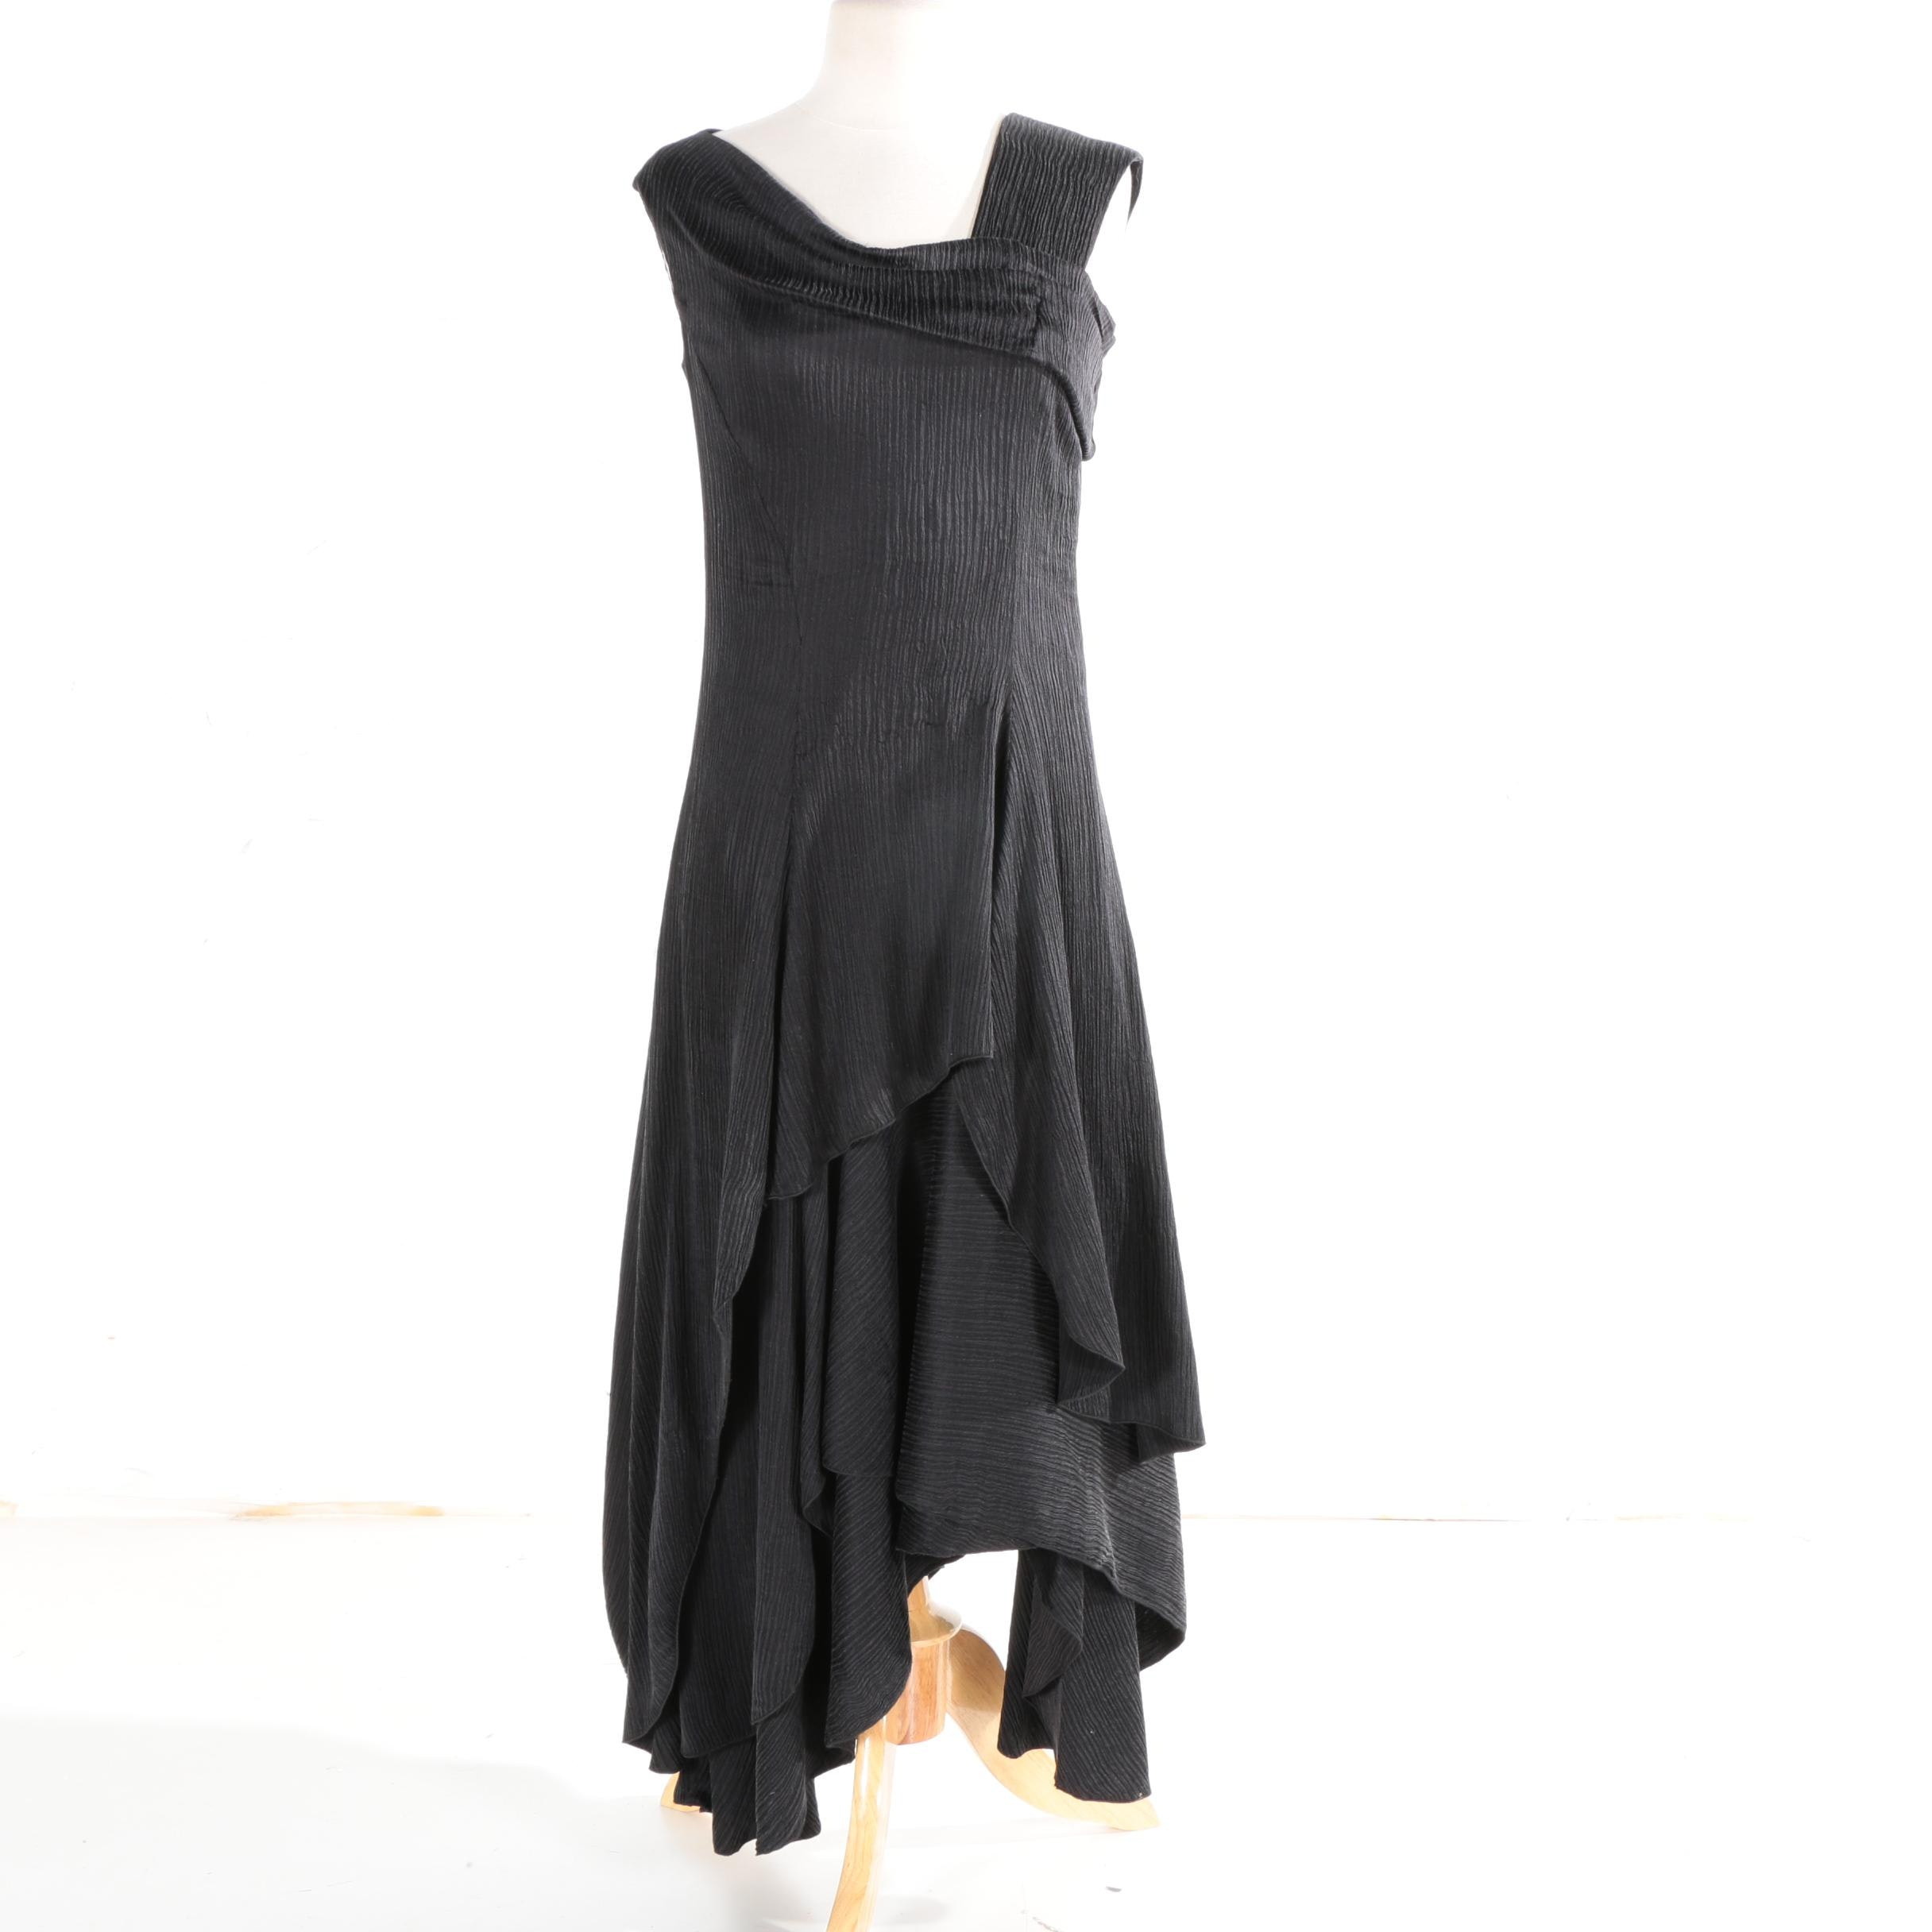 Anett Rostel Black Silk Cocktail Dress